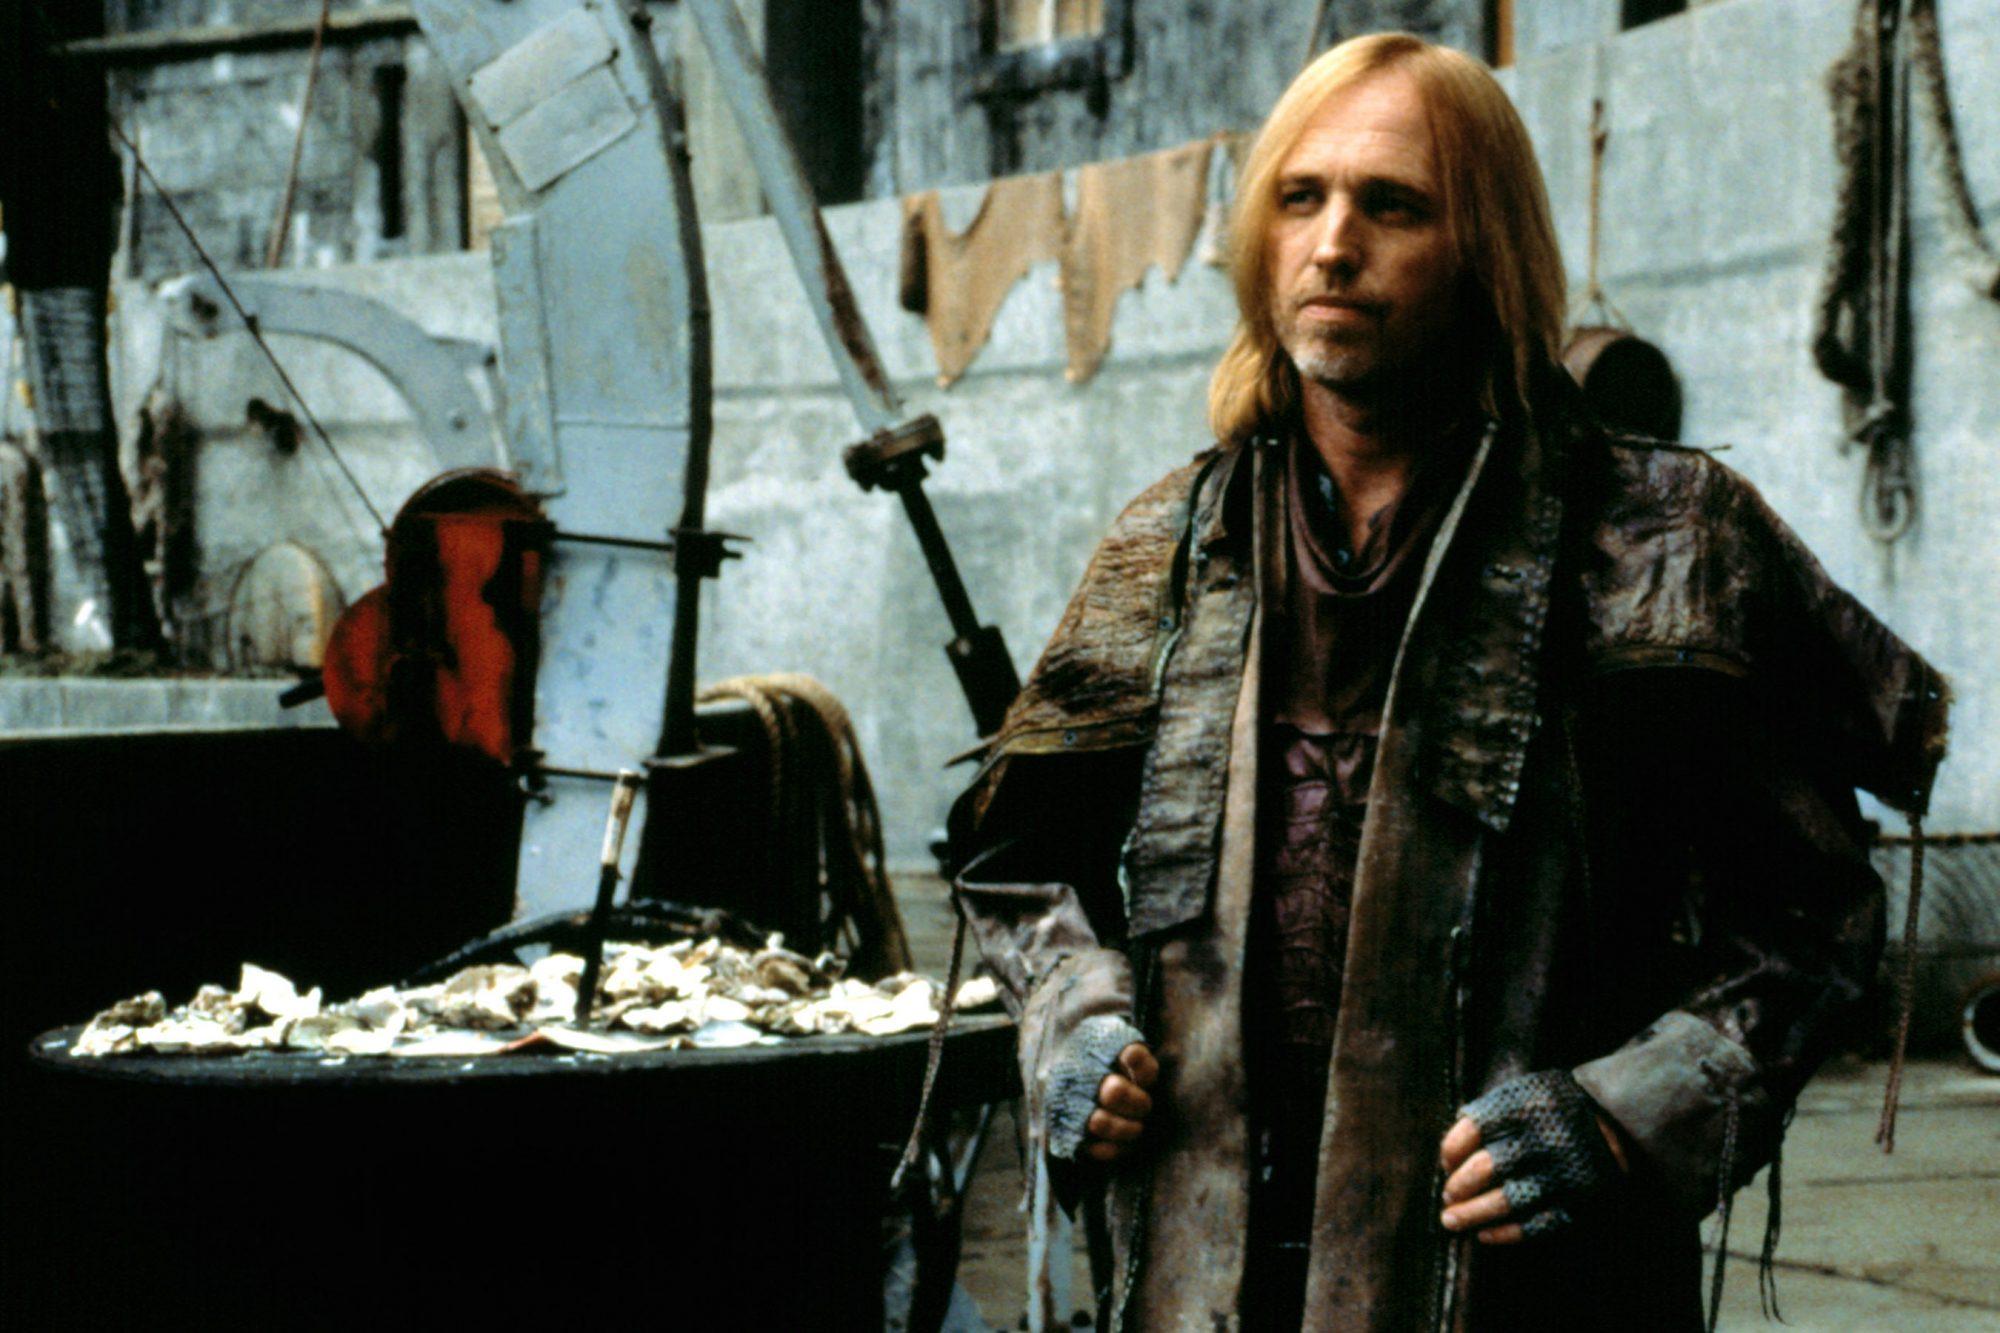 THE POSTMAN, Tom Petty, 1997